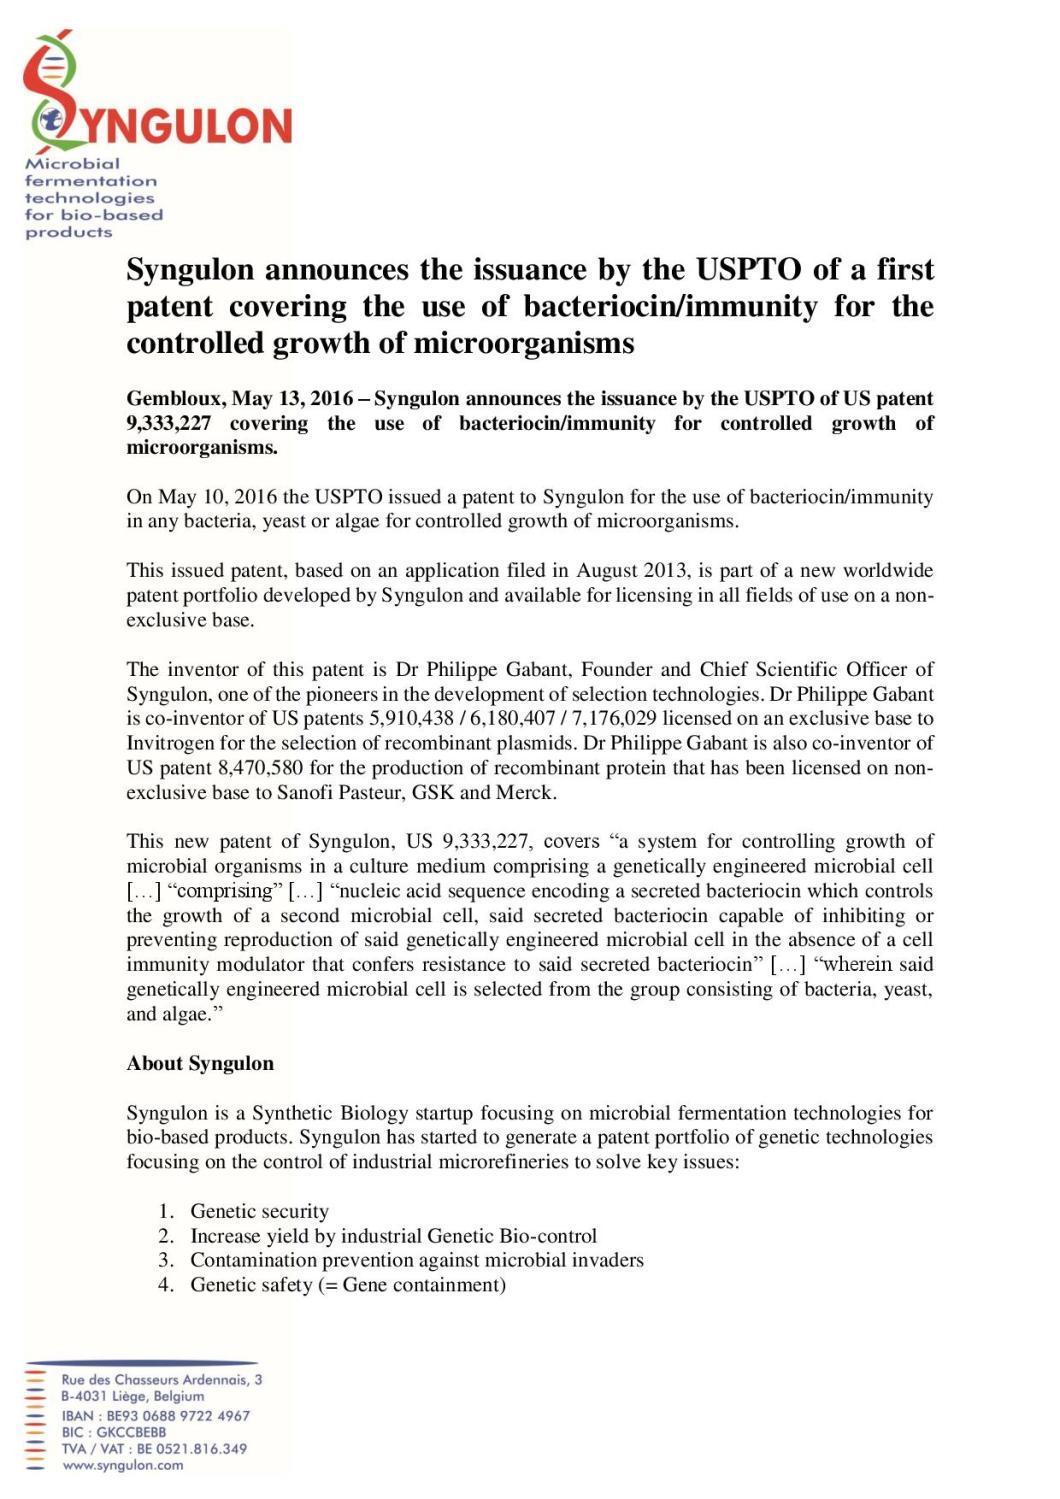 PRESS RELEASE  Syngulon - US Patent 9,333,227-page-001